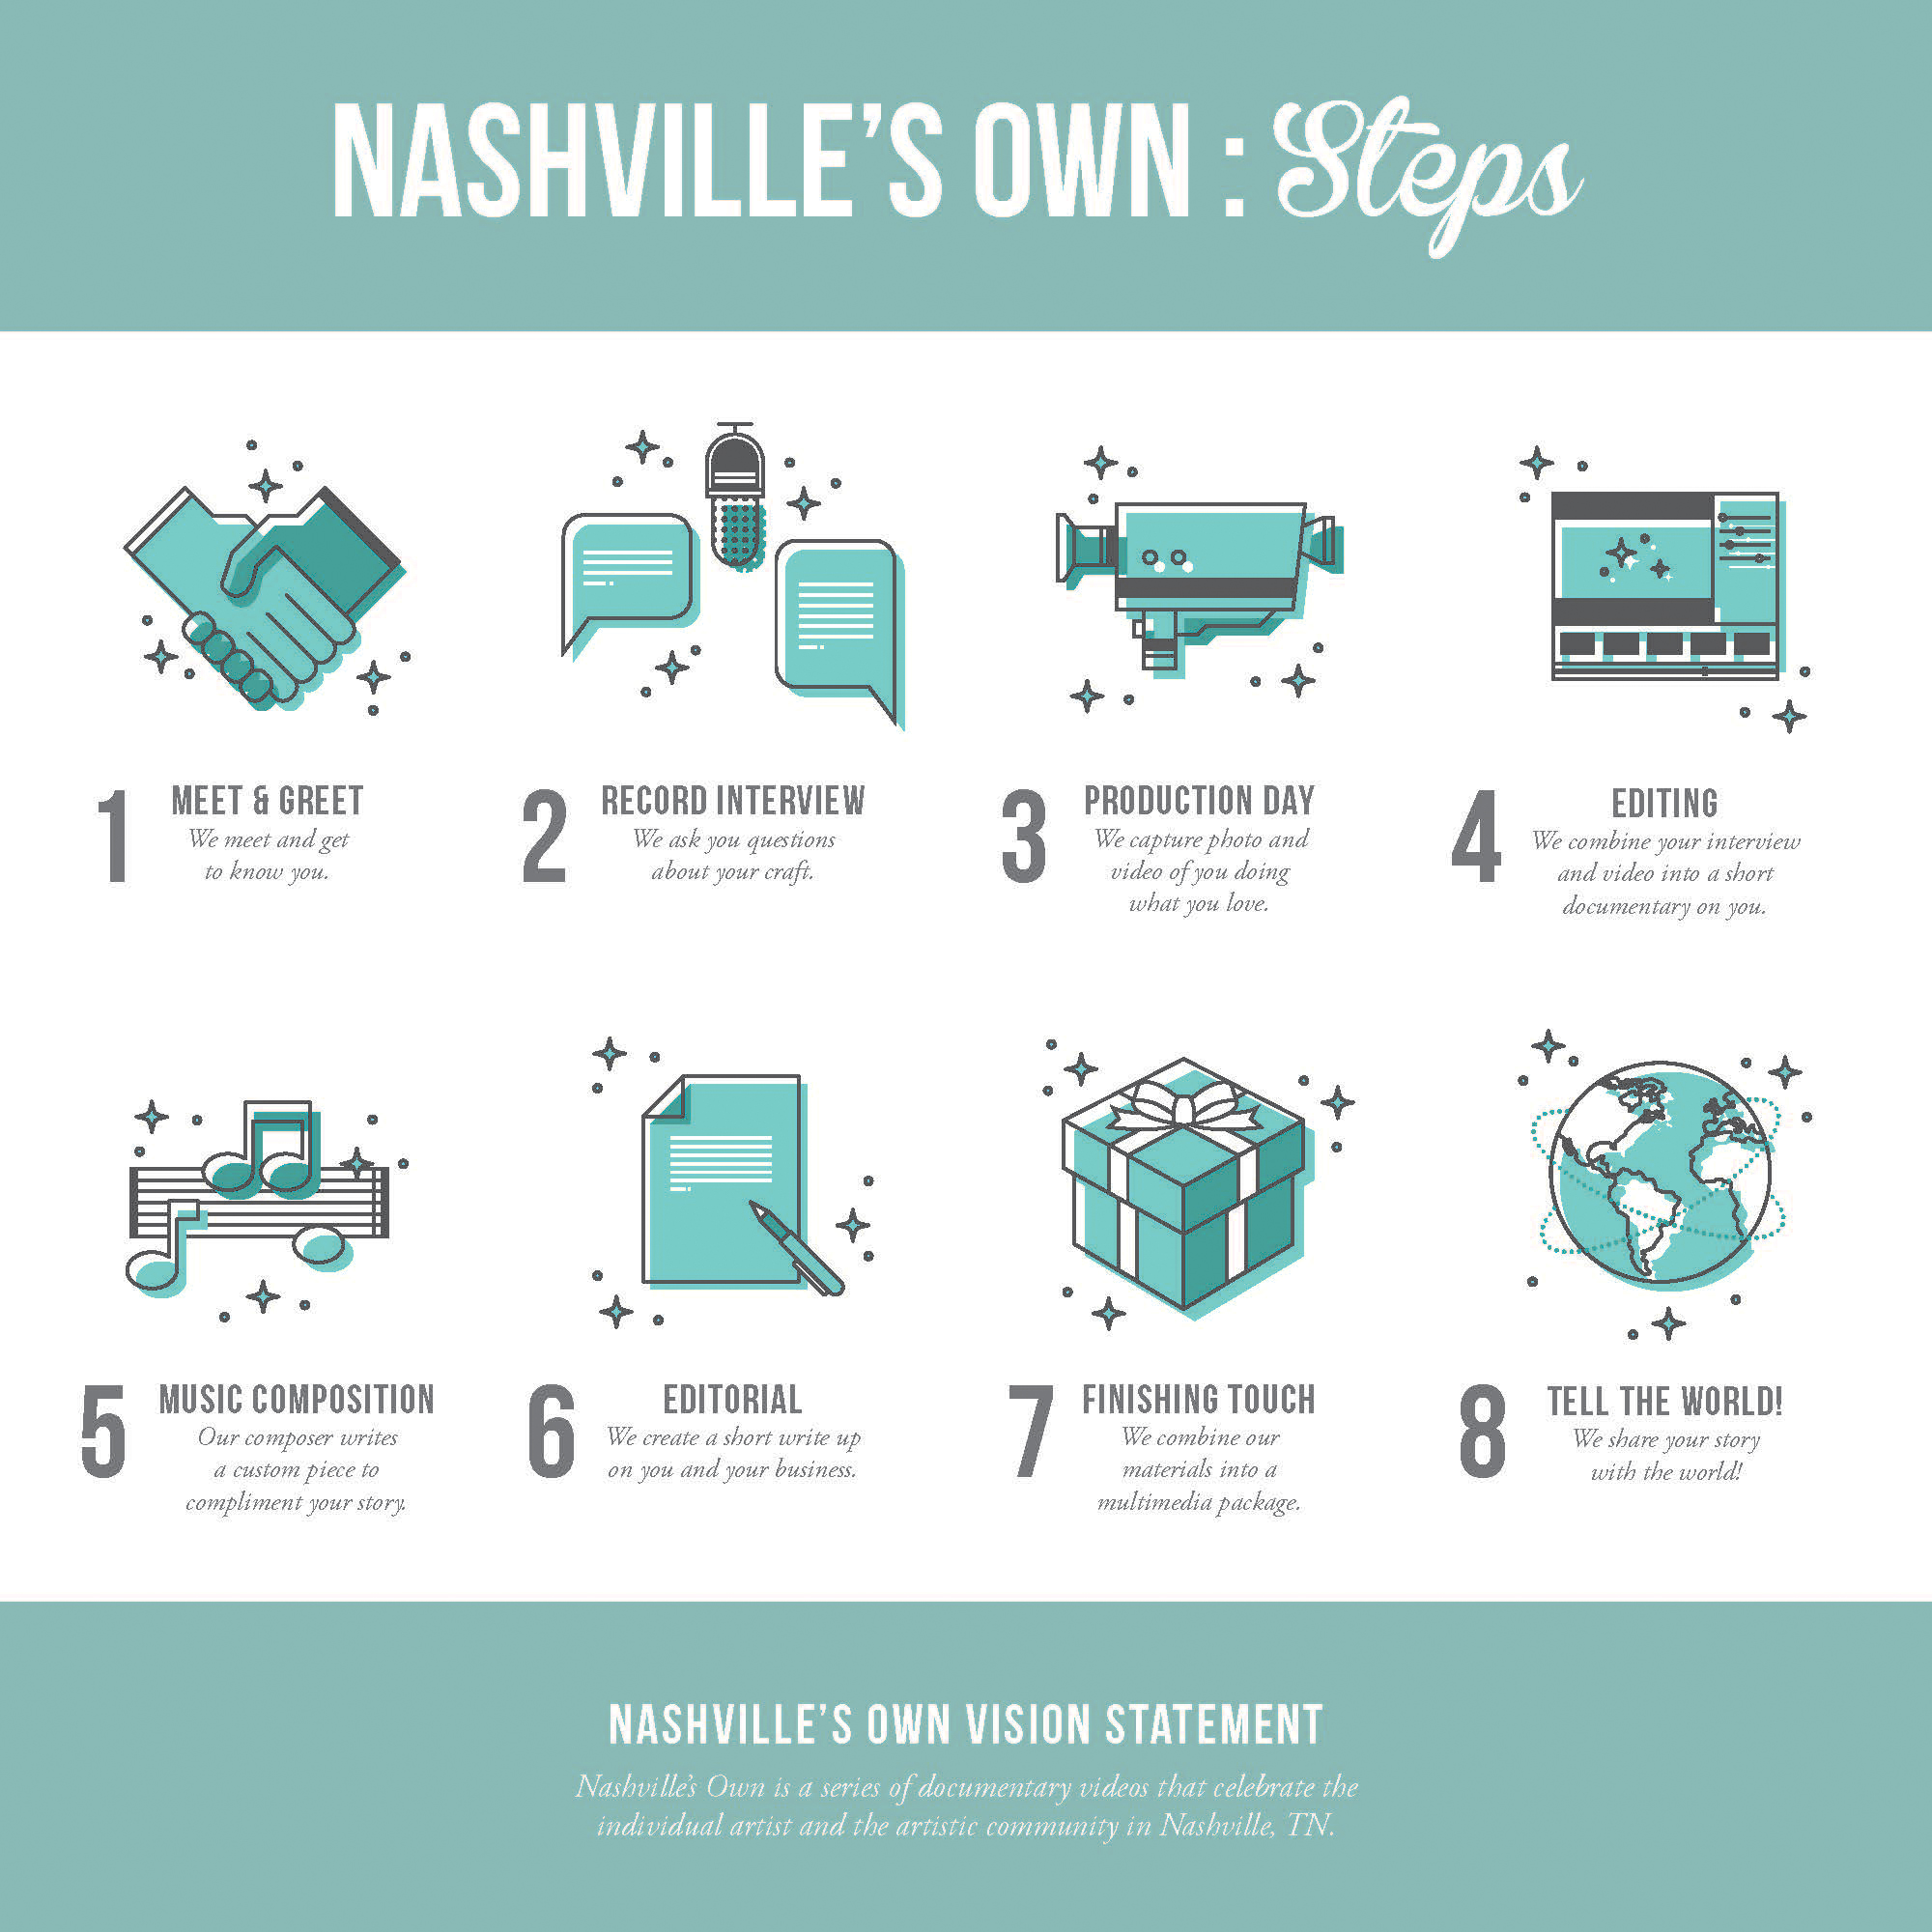 Andrew Yontz - Nashville's Own Informational Material_v1_Page_1.jpg